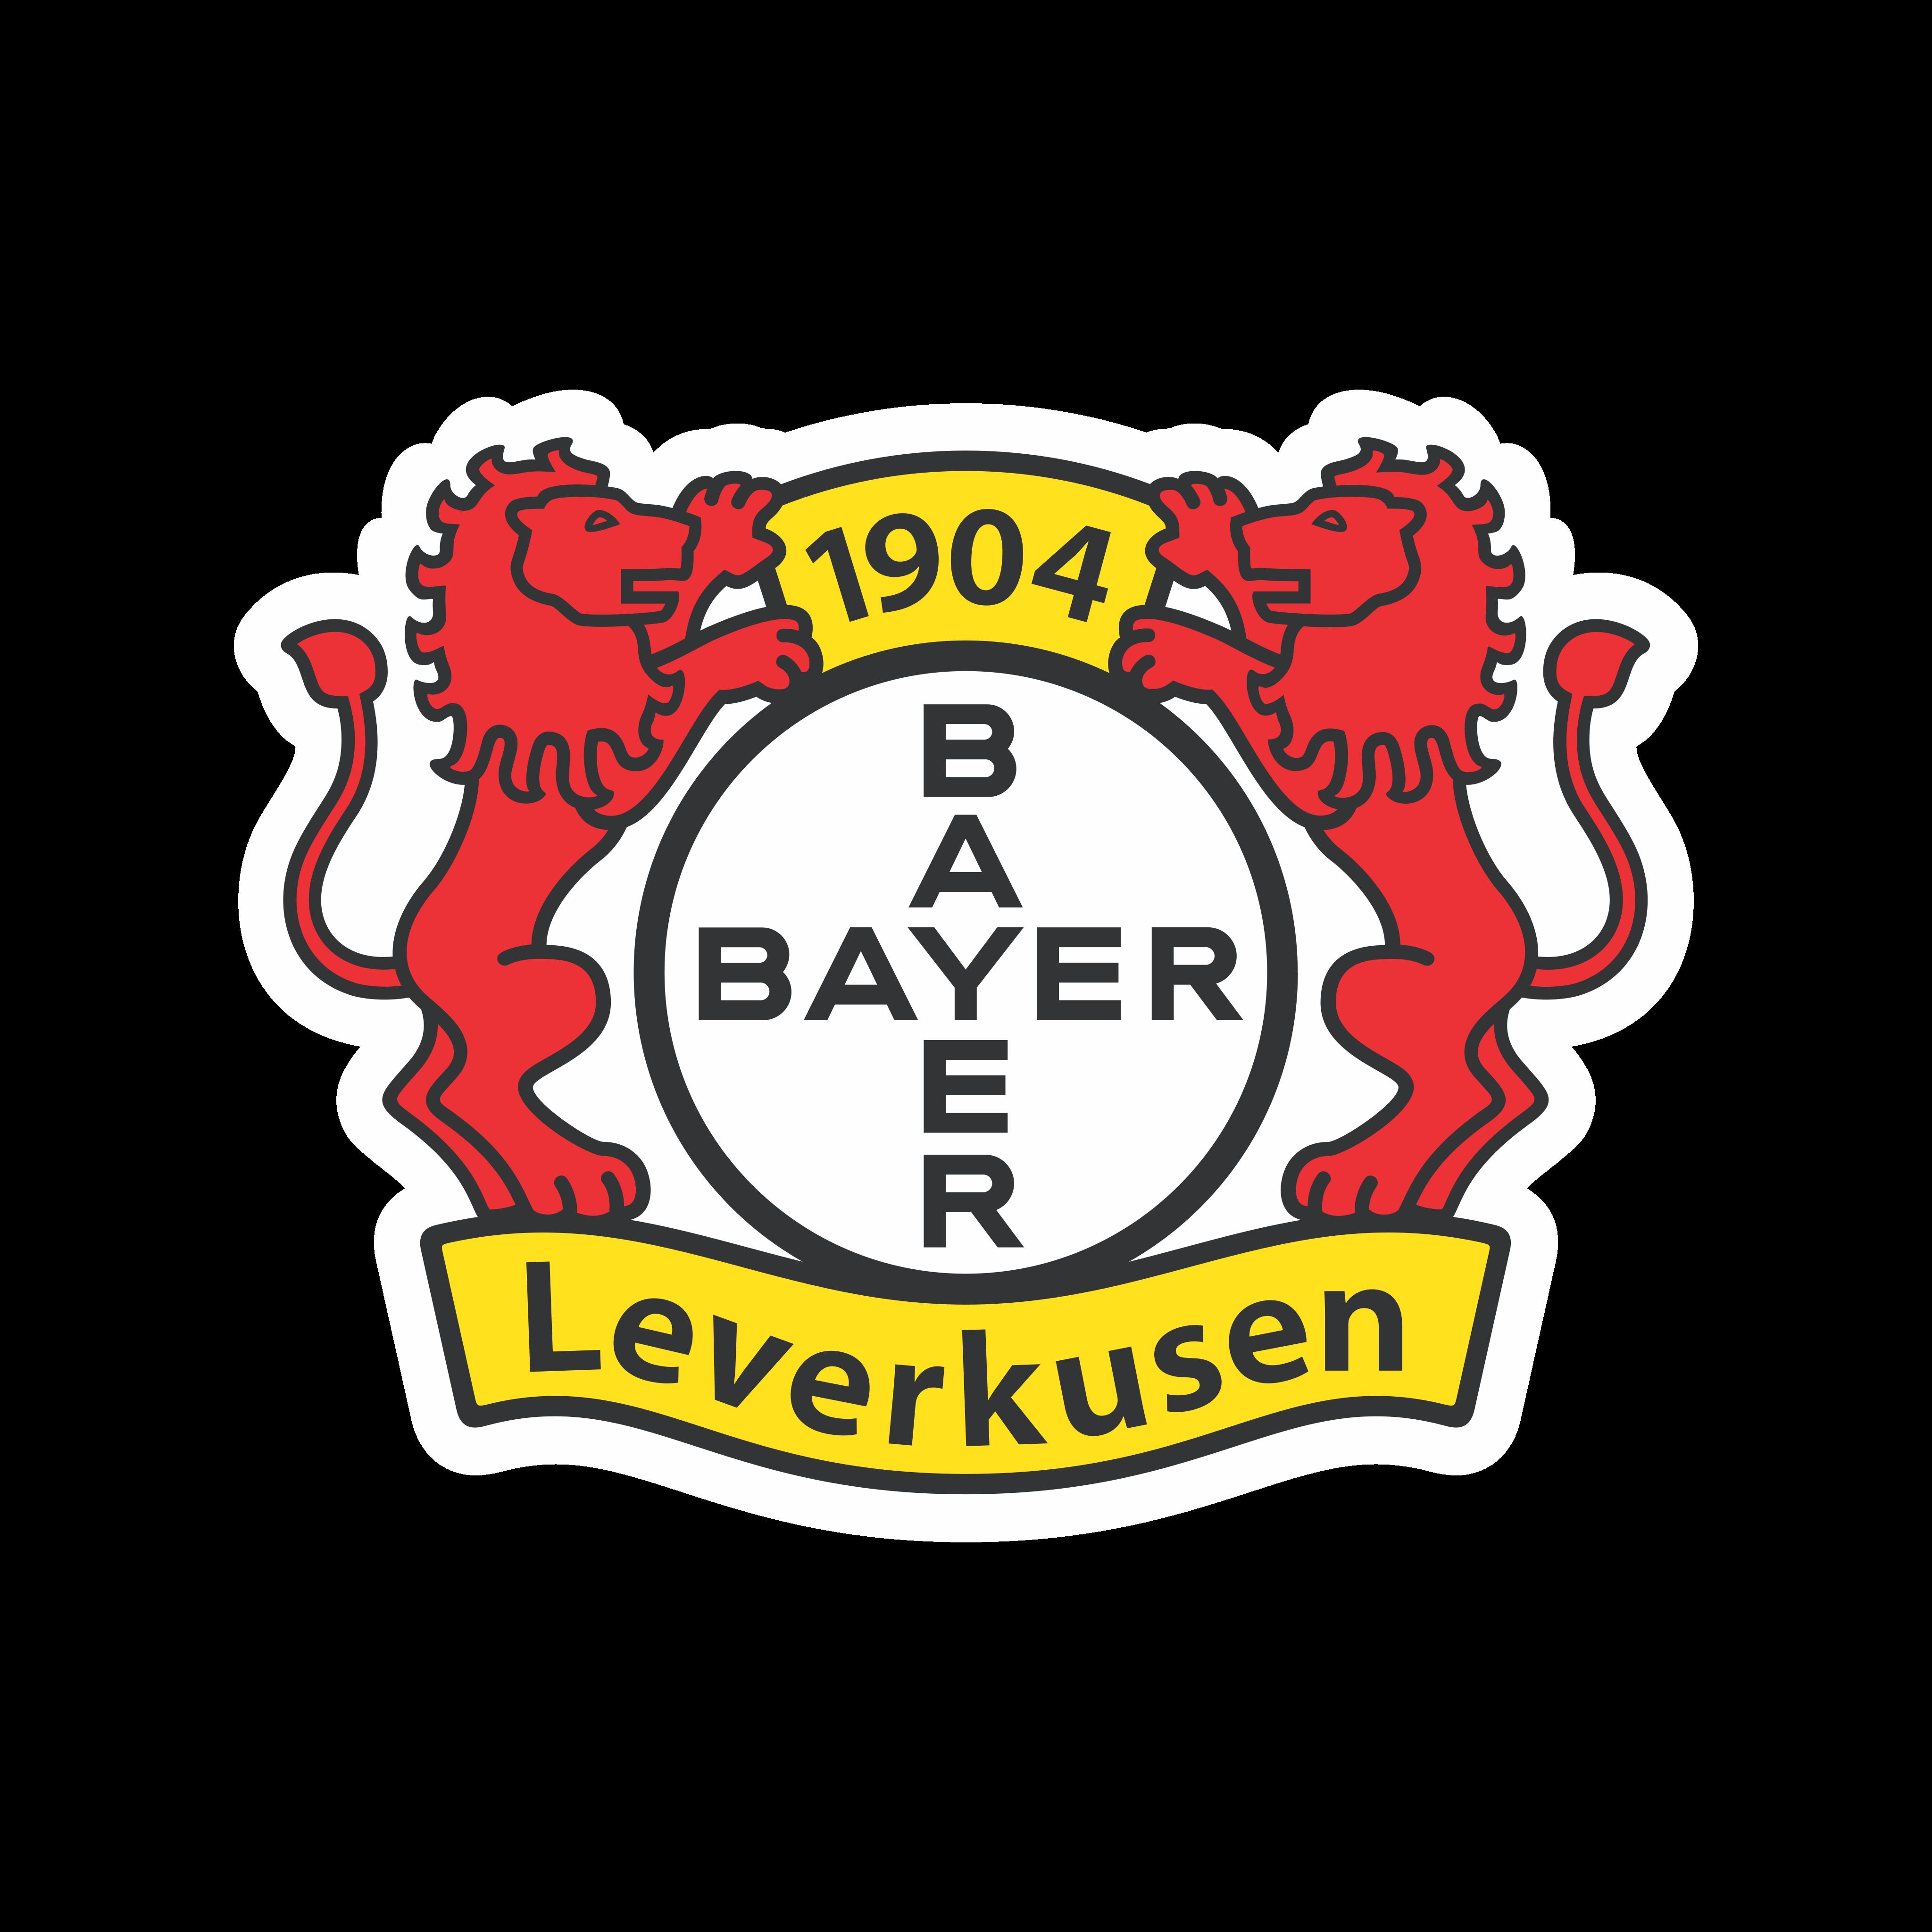 bayer 04 Leverkusen logo 0 - Bayer 04 Leverkusen Logo